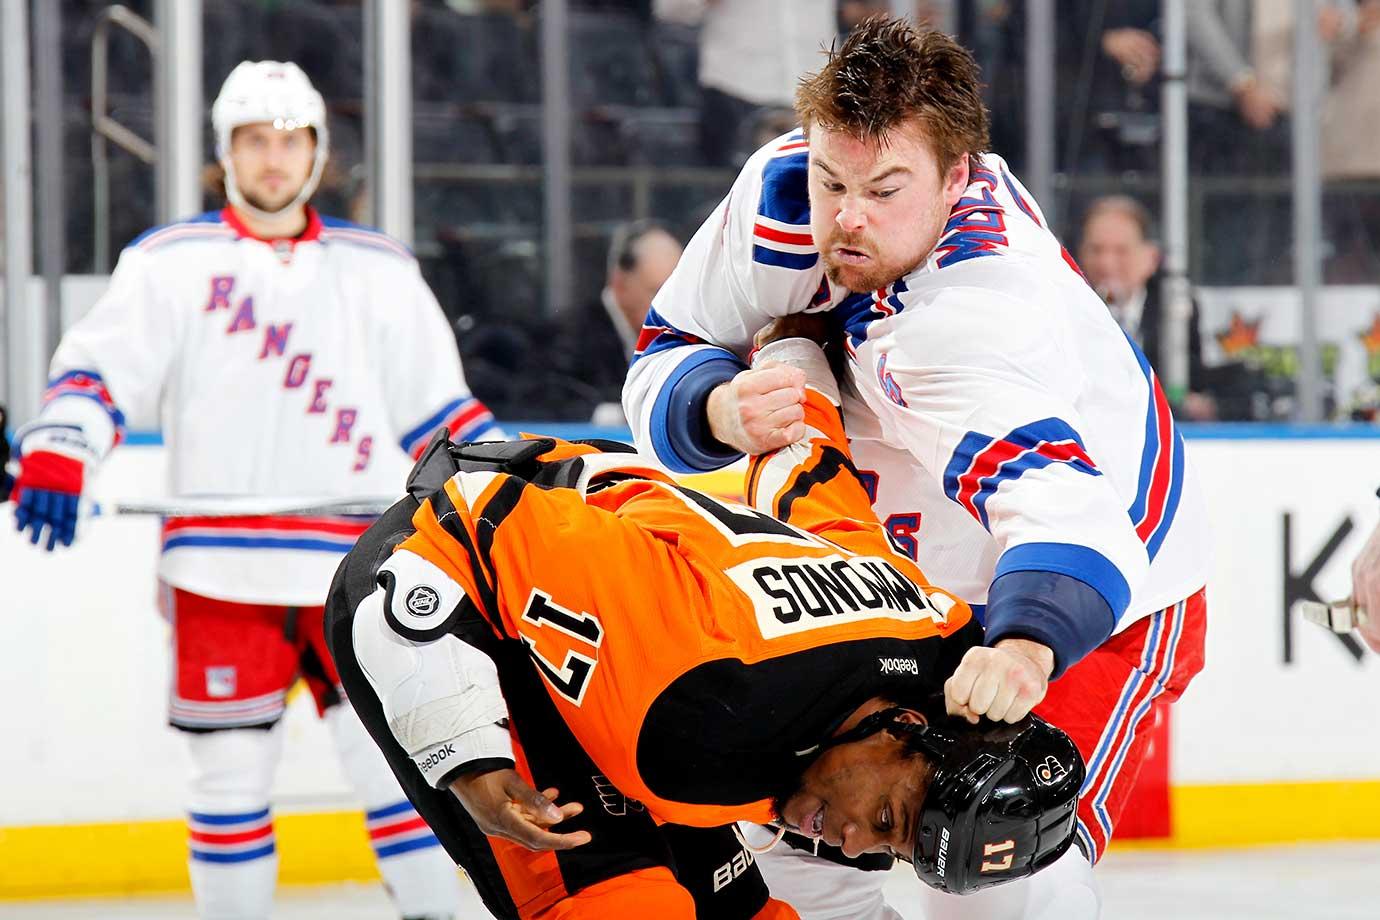 Dylan McIlrath of the New York Rangers fights Wayne Simmonds of the Philadelphia Flyers.